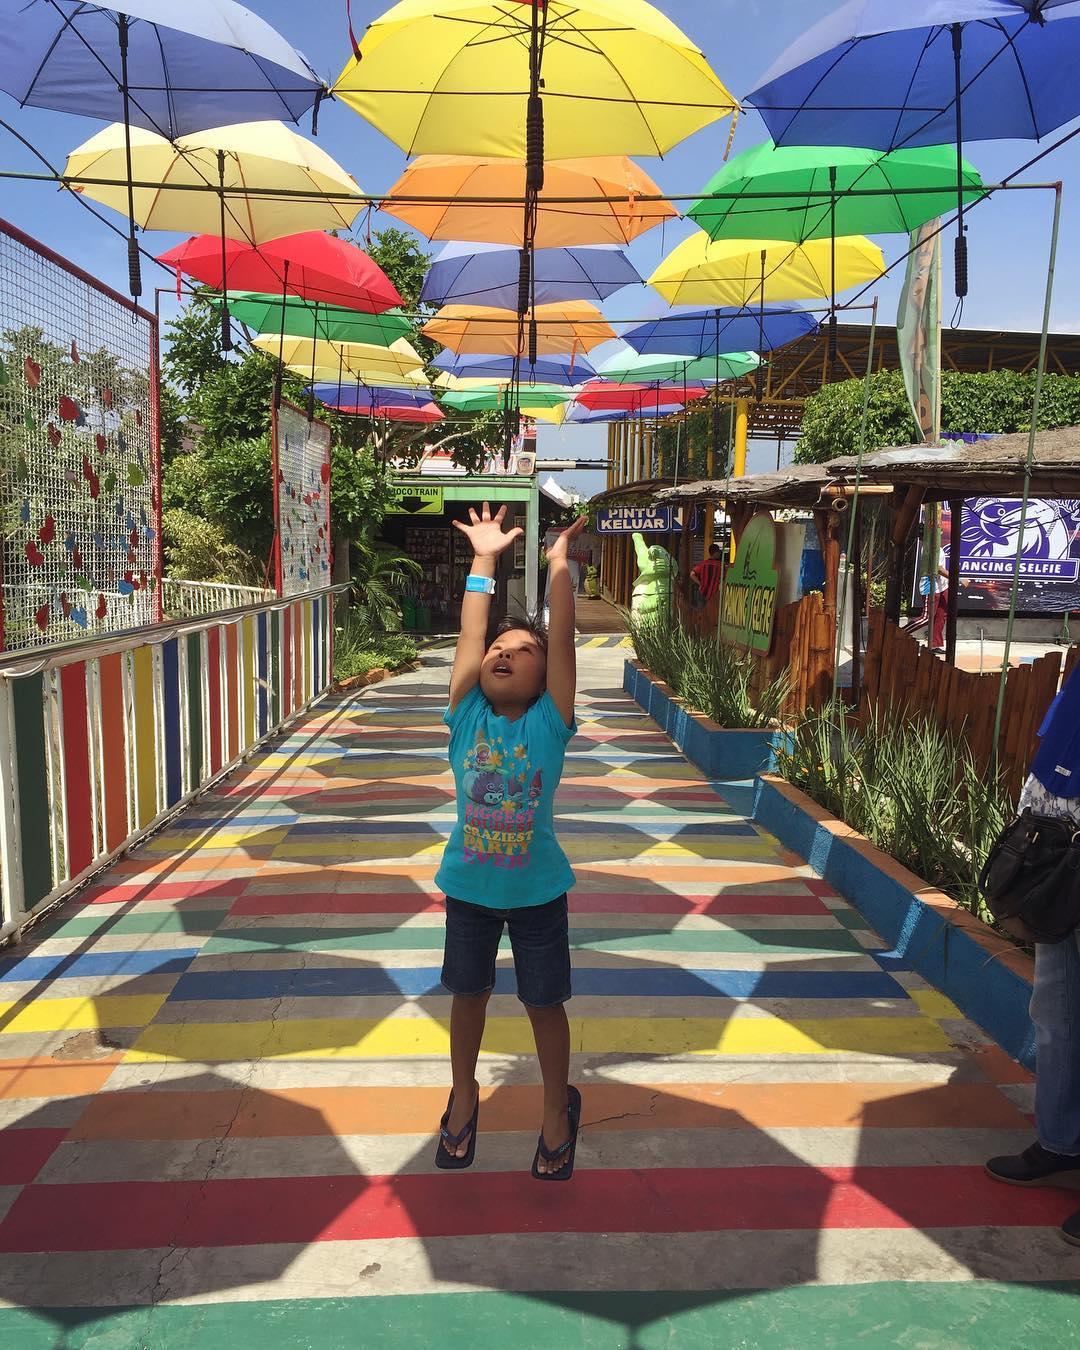 Predator Fun Park, Predator Fun Park Kota Batu, Malang Raya, Dolan Dolen, Dolaners Predator Fun Park via jatuyudhita - Dolan Dolen